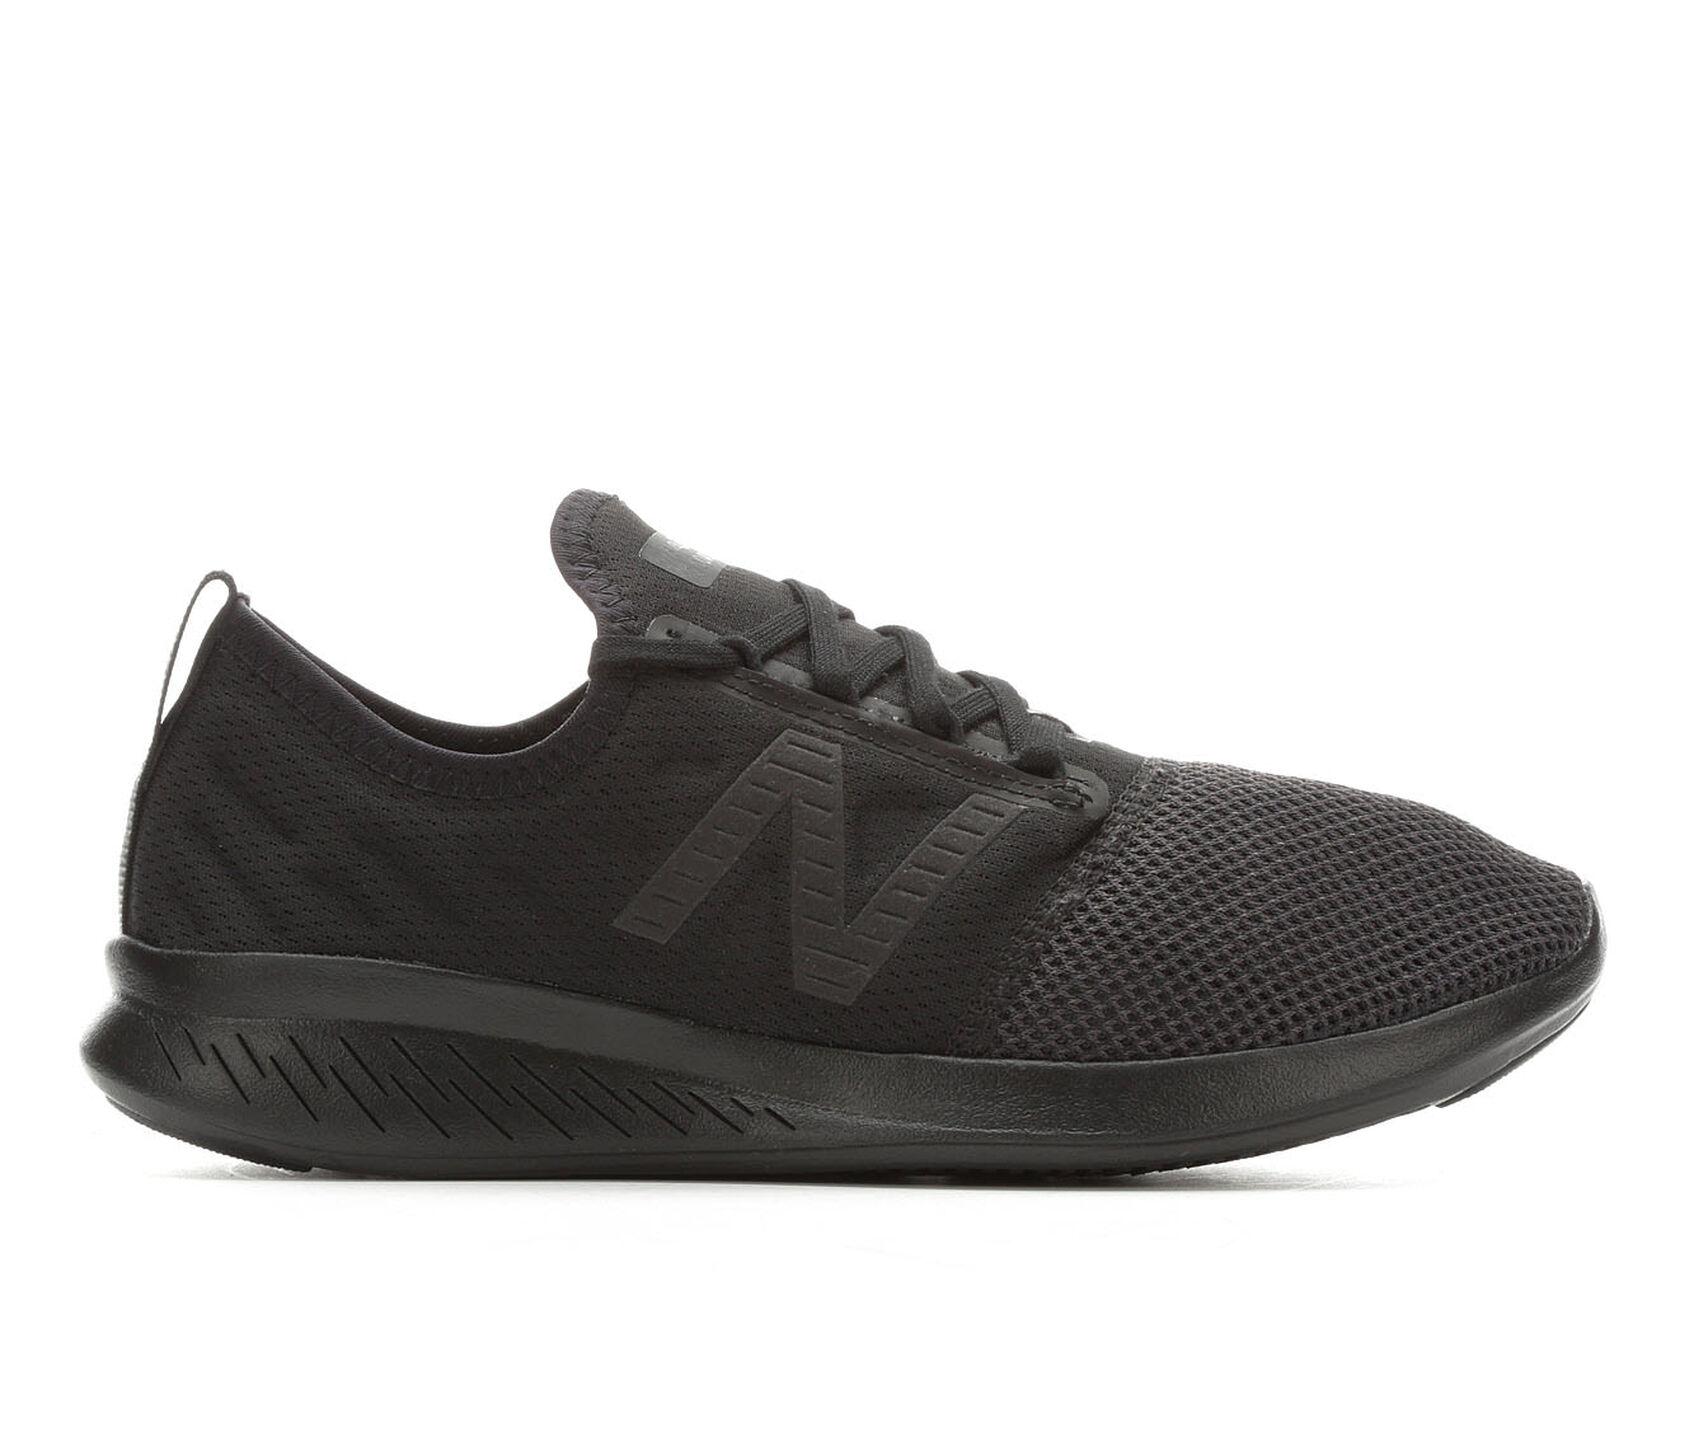 2b55aaf04c2 Women s New Balance Coast 4 Sneakers